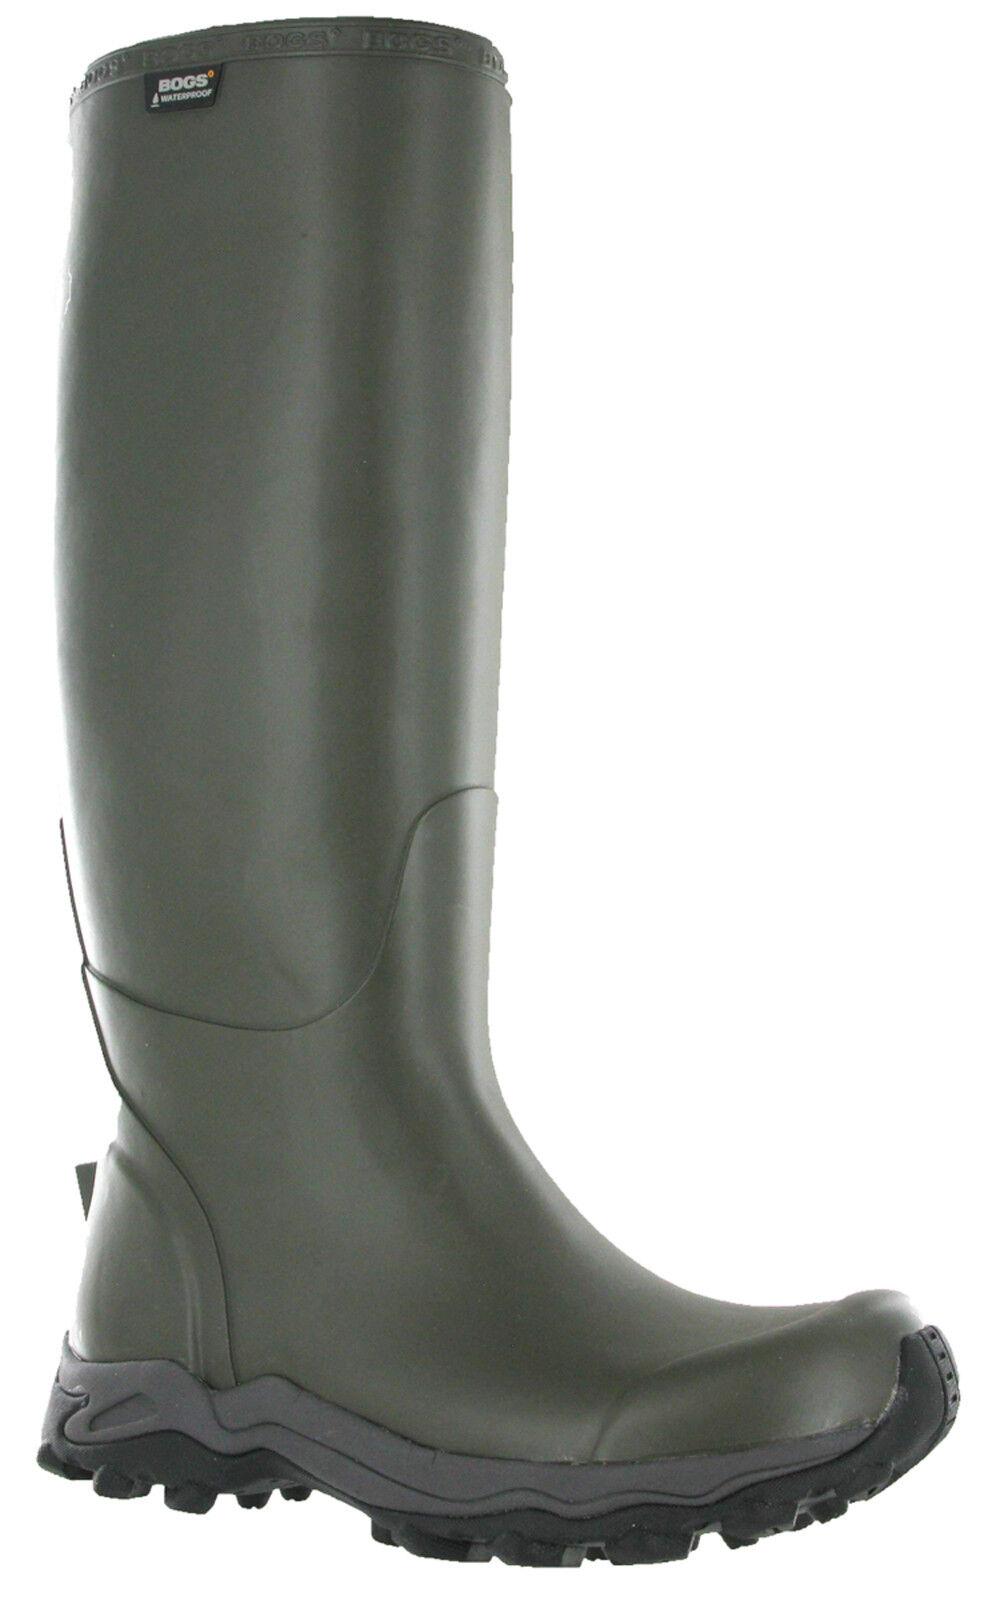 Bogs Wellingtons Farmer Tall Bradford Rubber Stiefel Cushioned Grip Wellies Mens